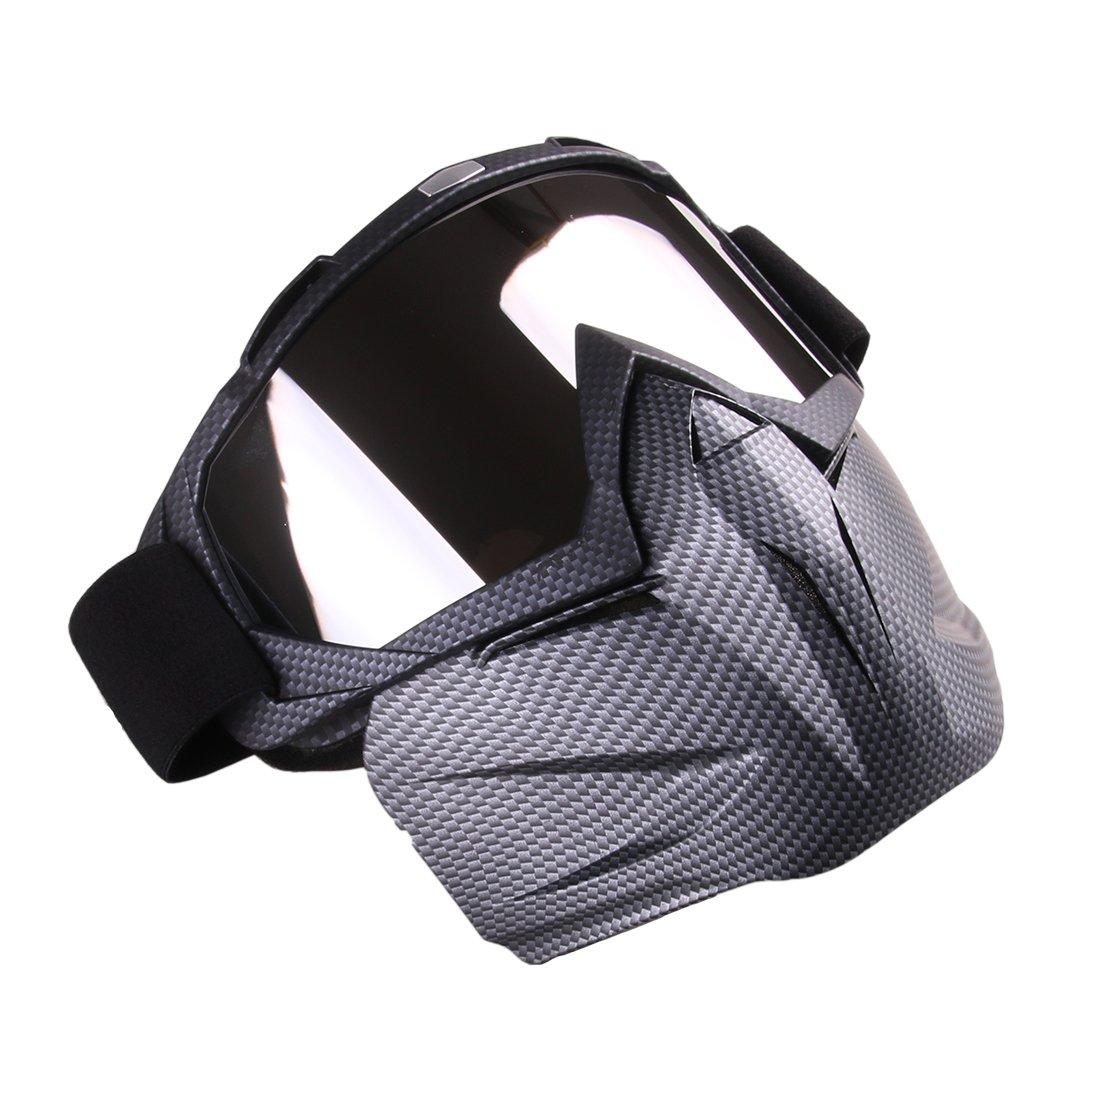 lommer desmontable Espejo Estilo protecci/ón m/áscara facial m/áscara t/áctica M/áscara Gafas para Nerf paintball y CS parte M/áscara Airsoft